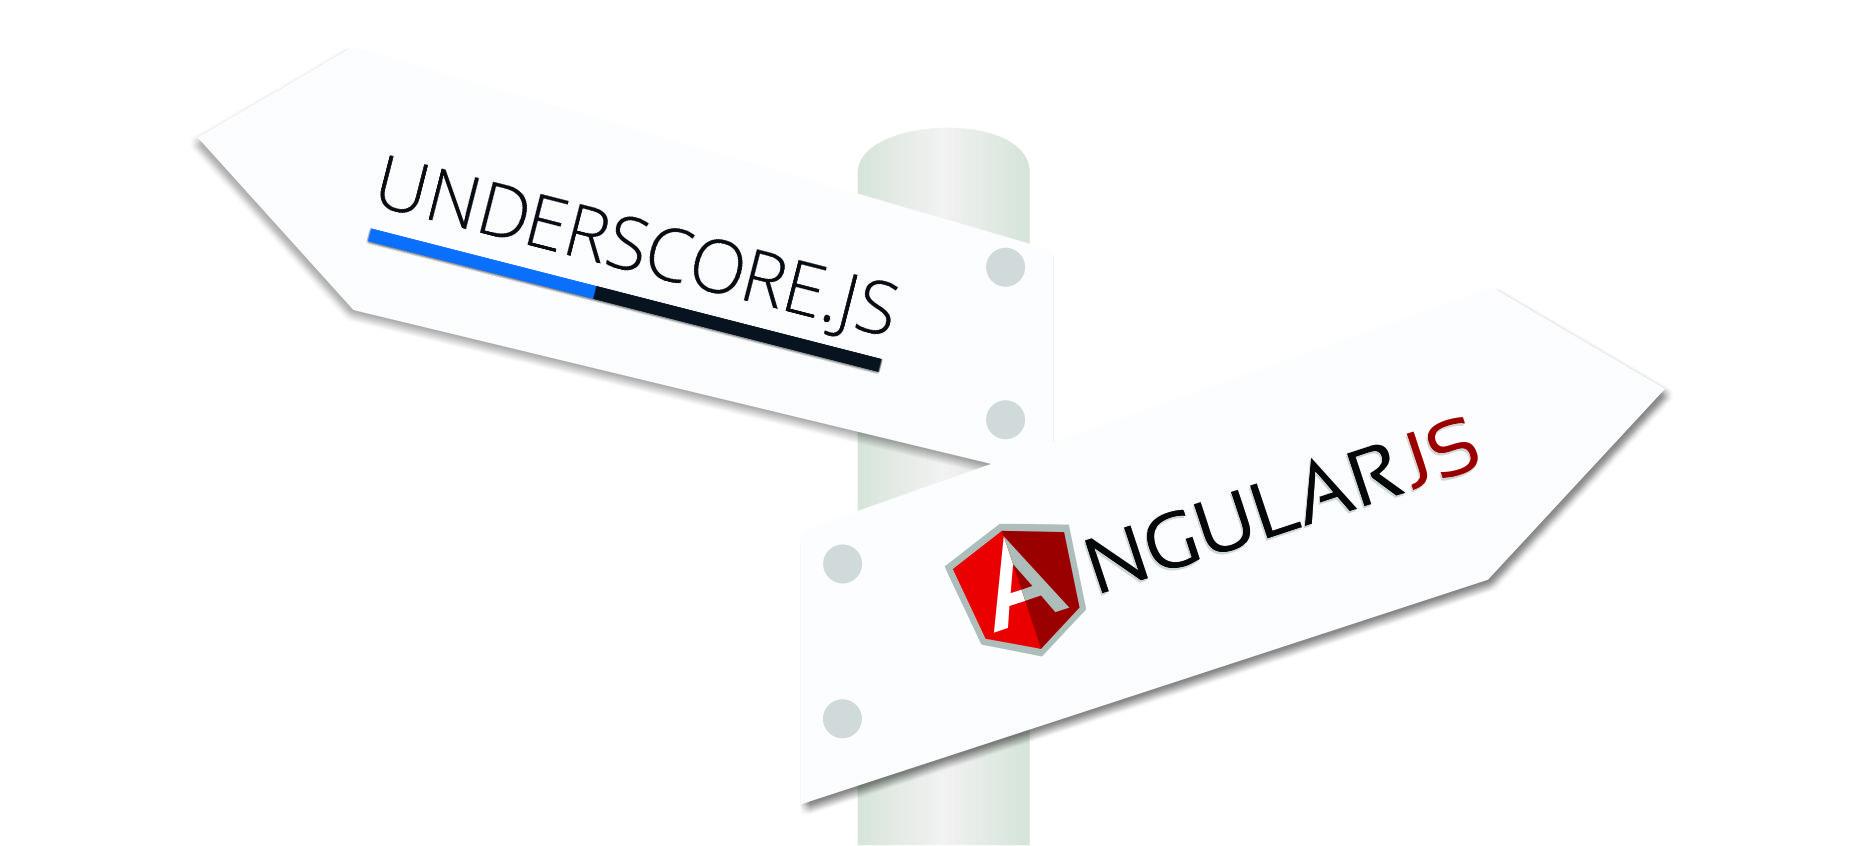 UnderscoreJs with AngularJs